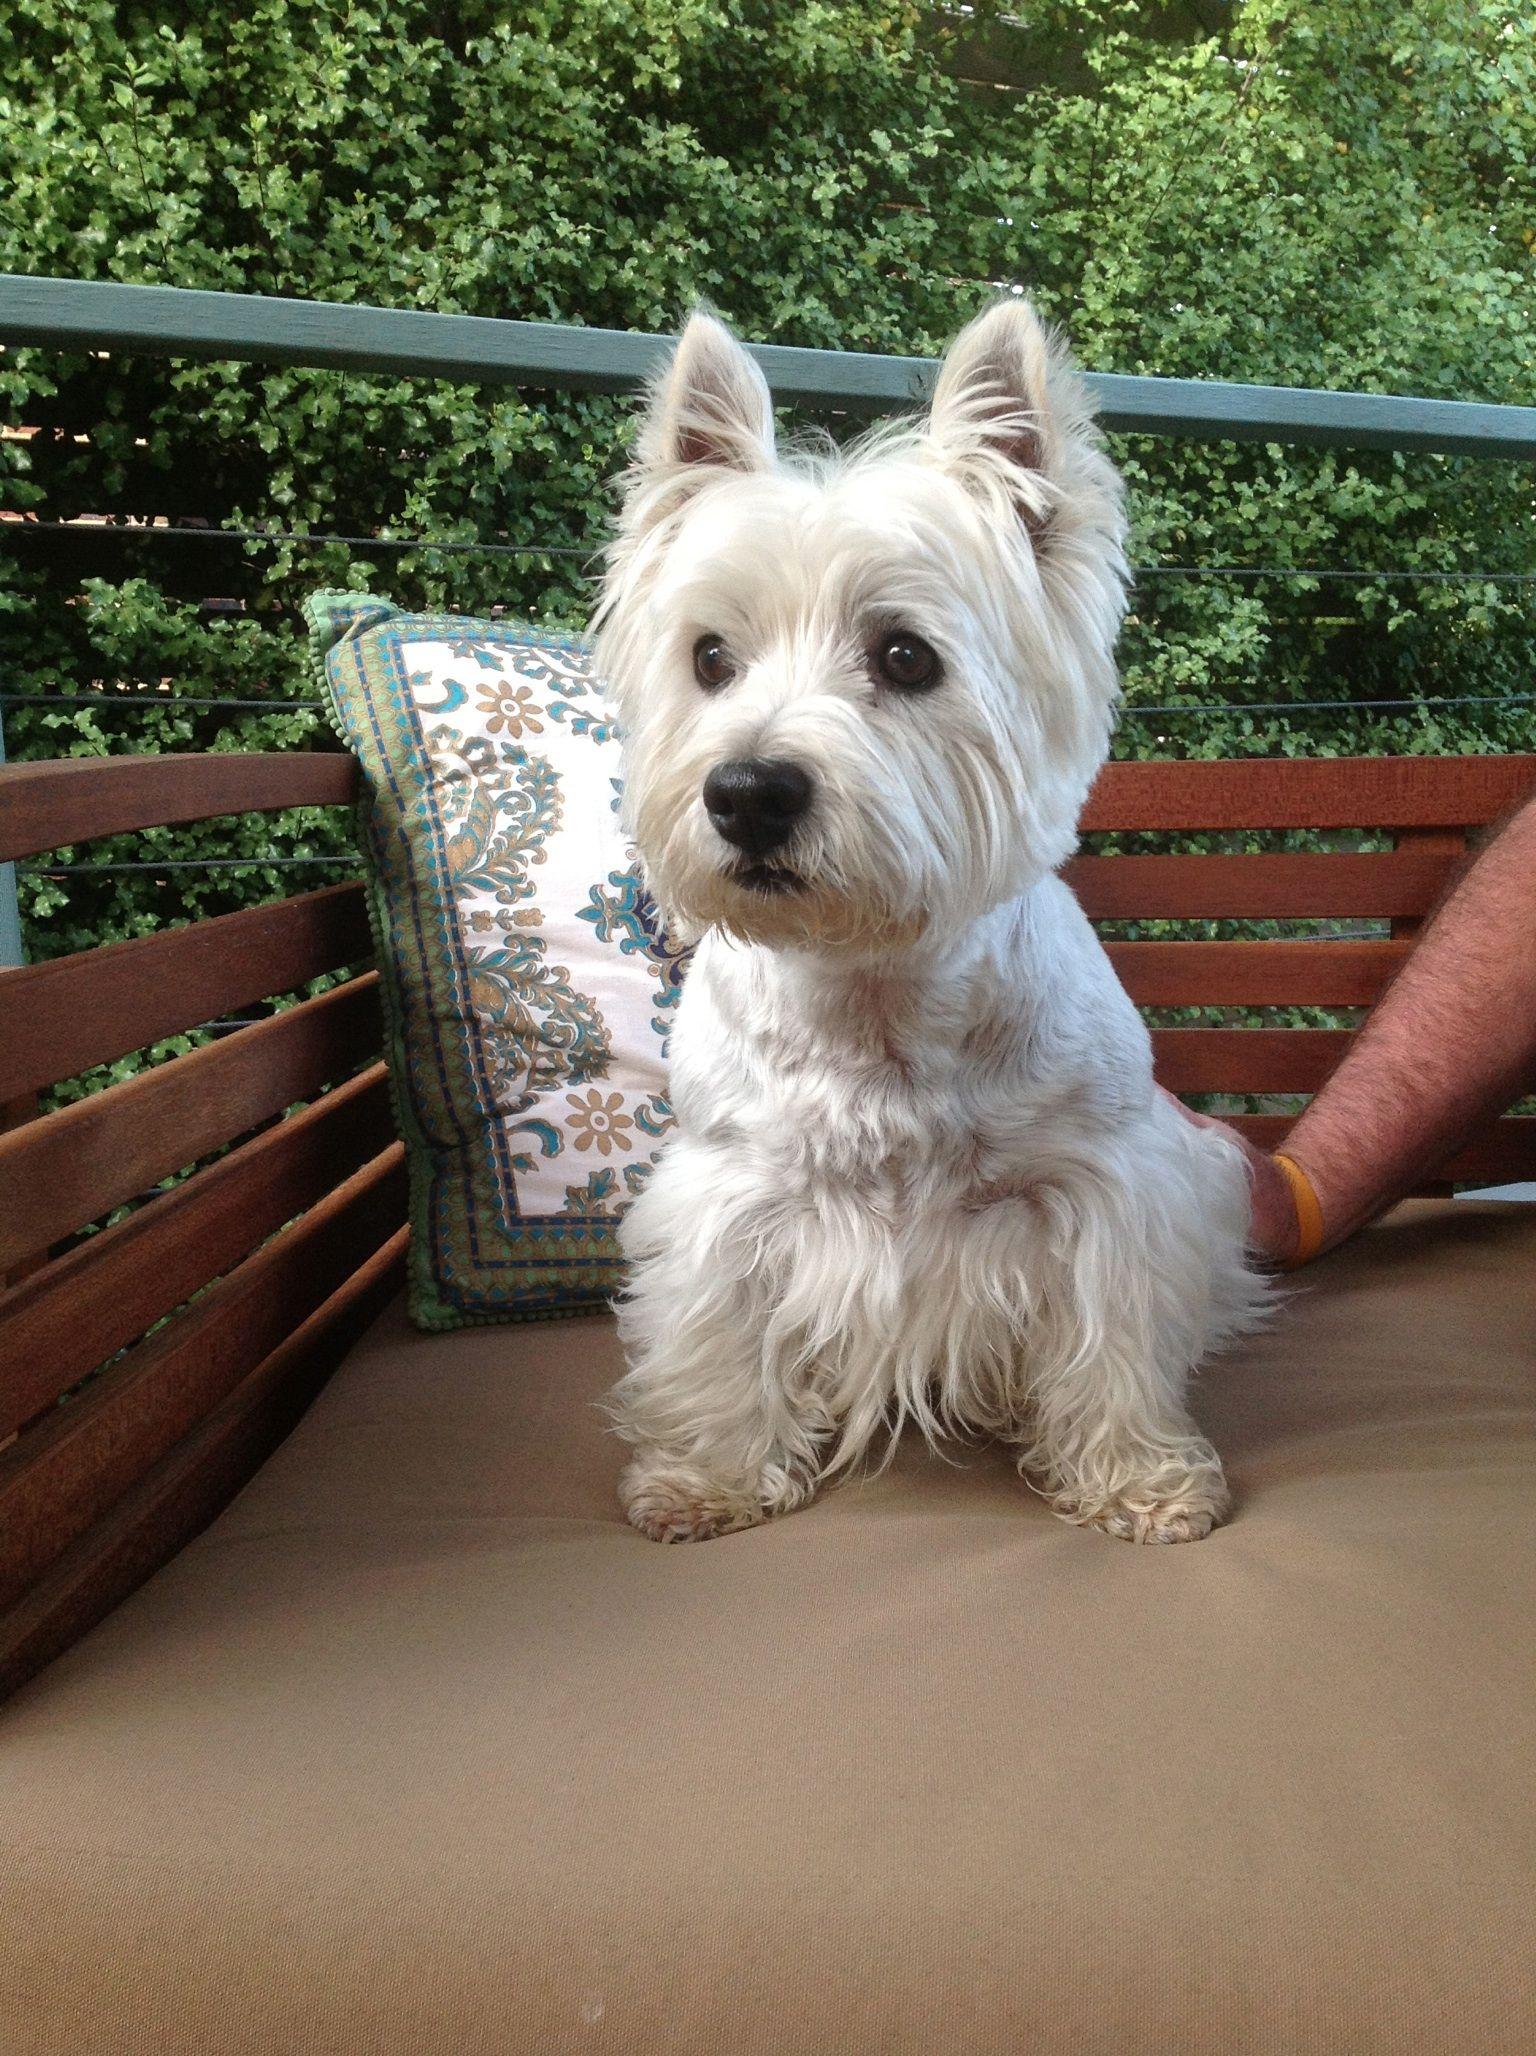 Sweet B0y Westie Westie Puppies Cute Dogs Breeds Westie Terrier